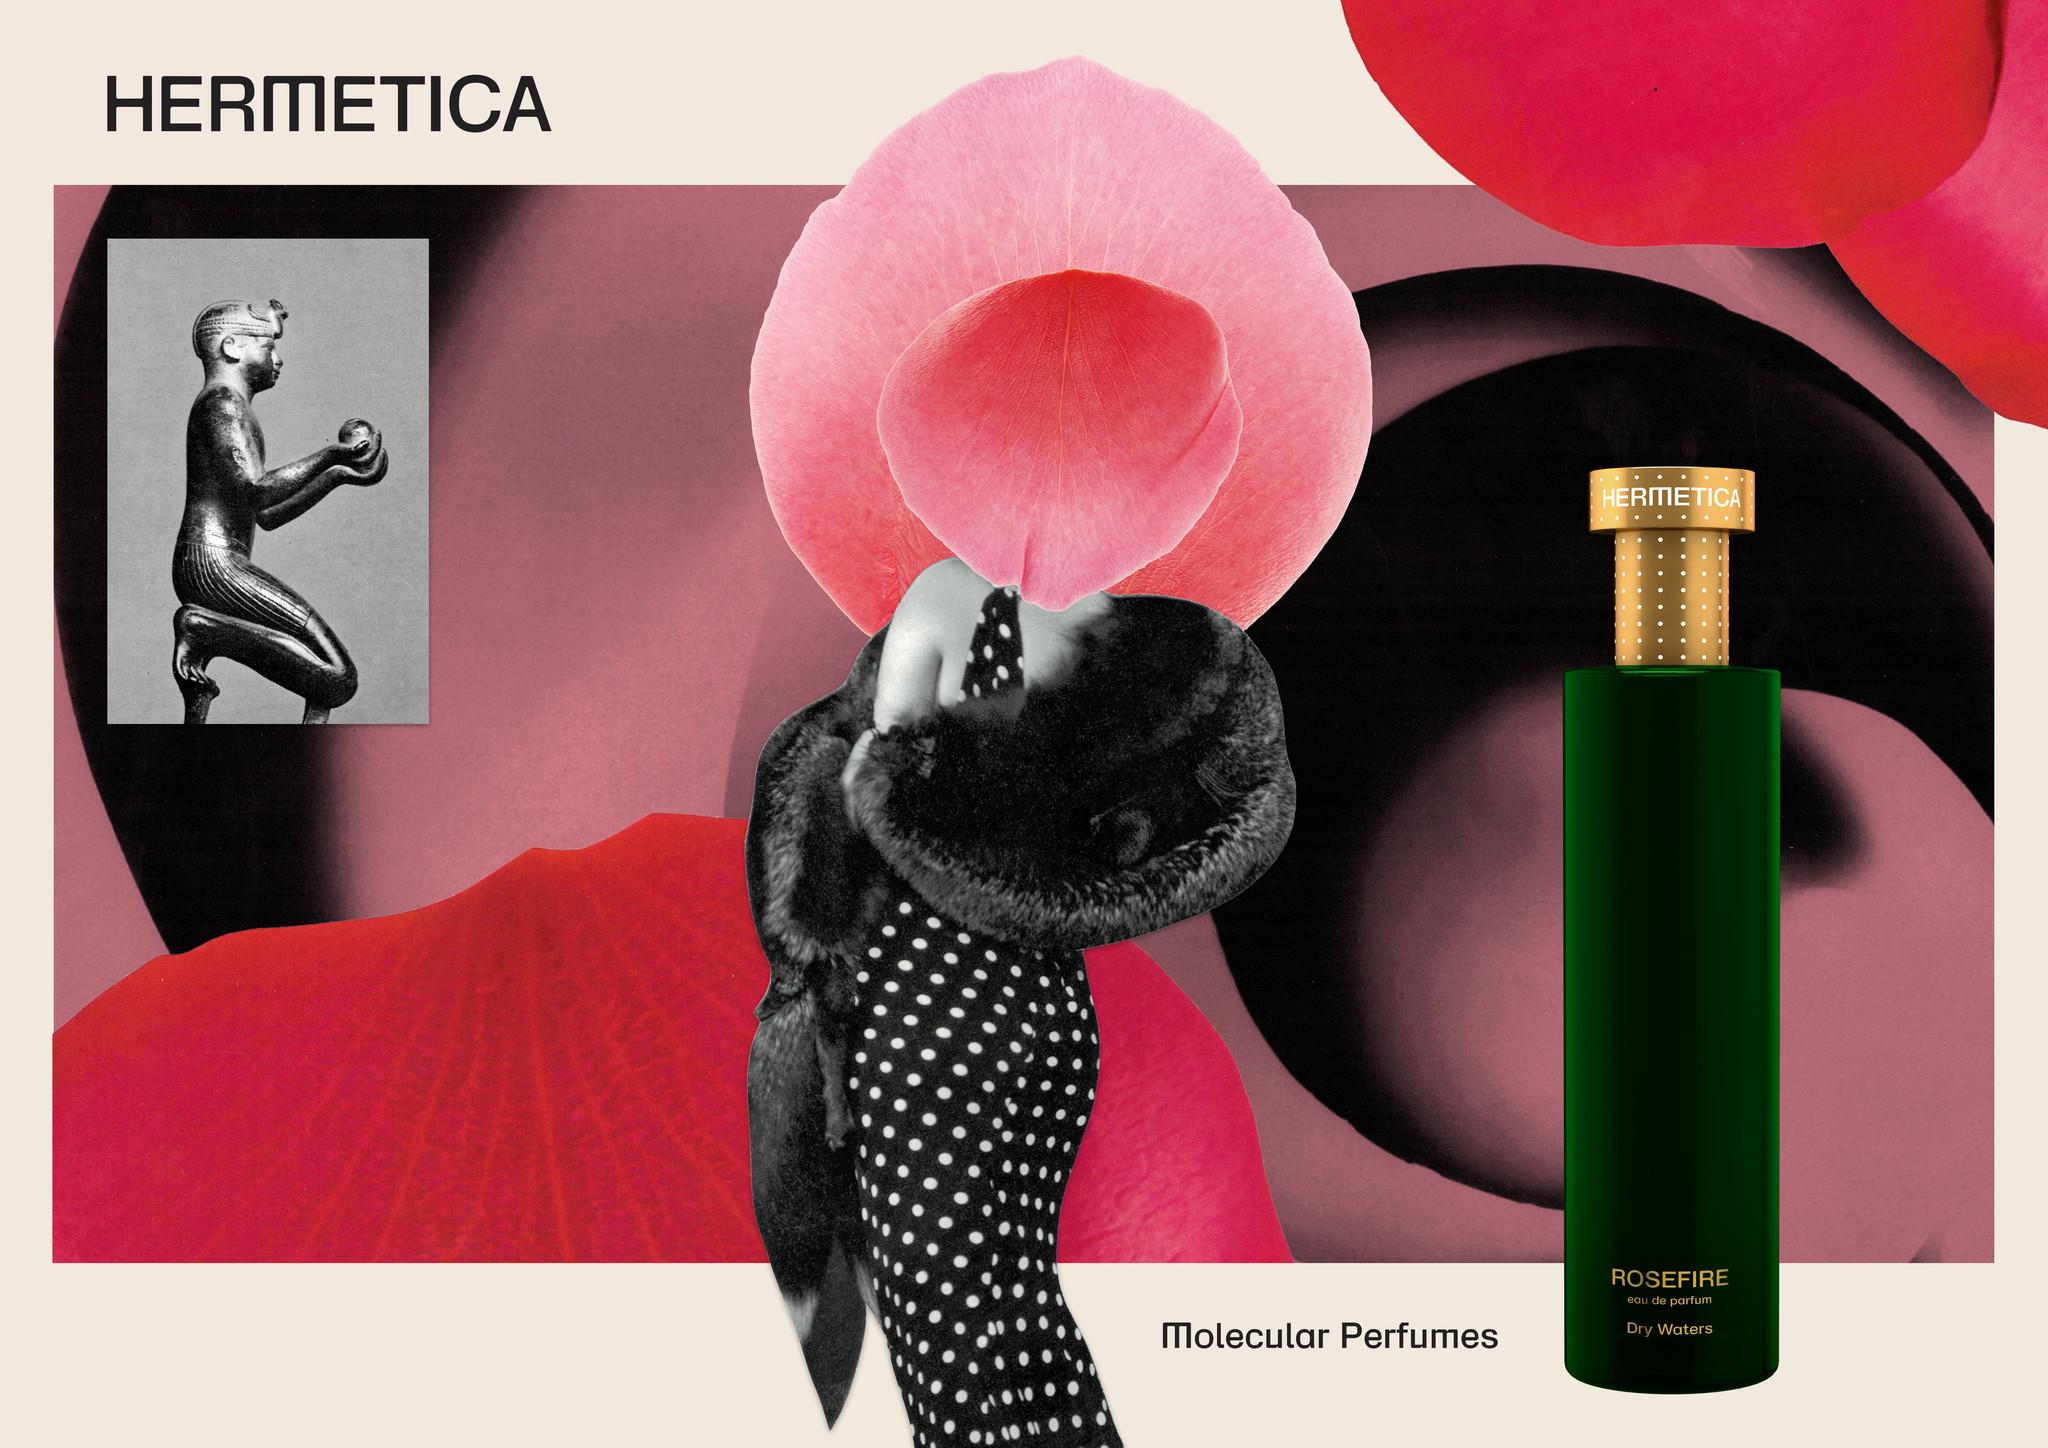 Australian Launch of Hermetica Molecular Perfumes